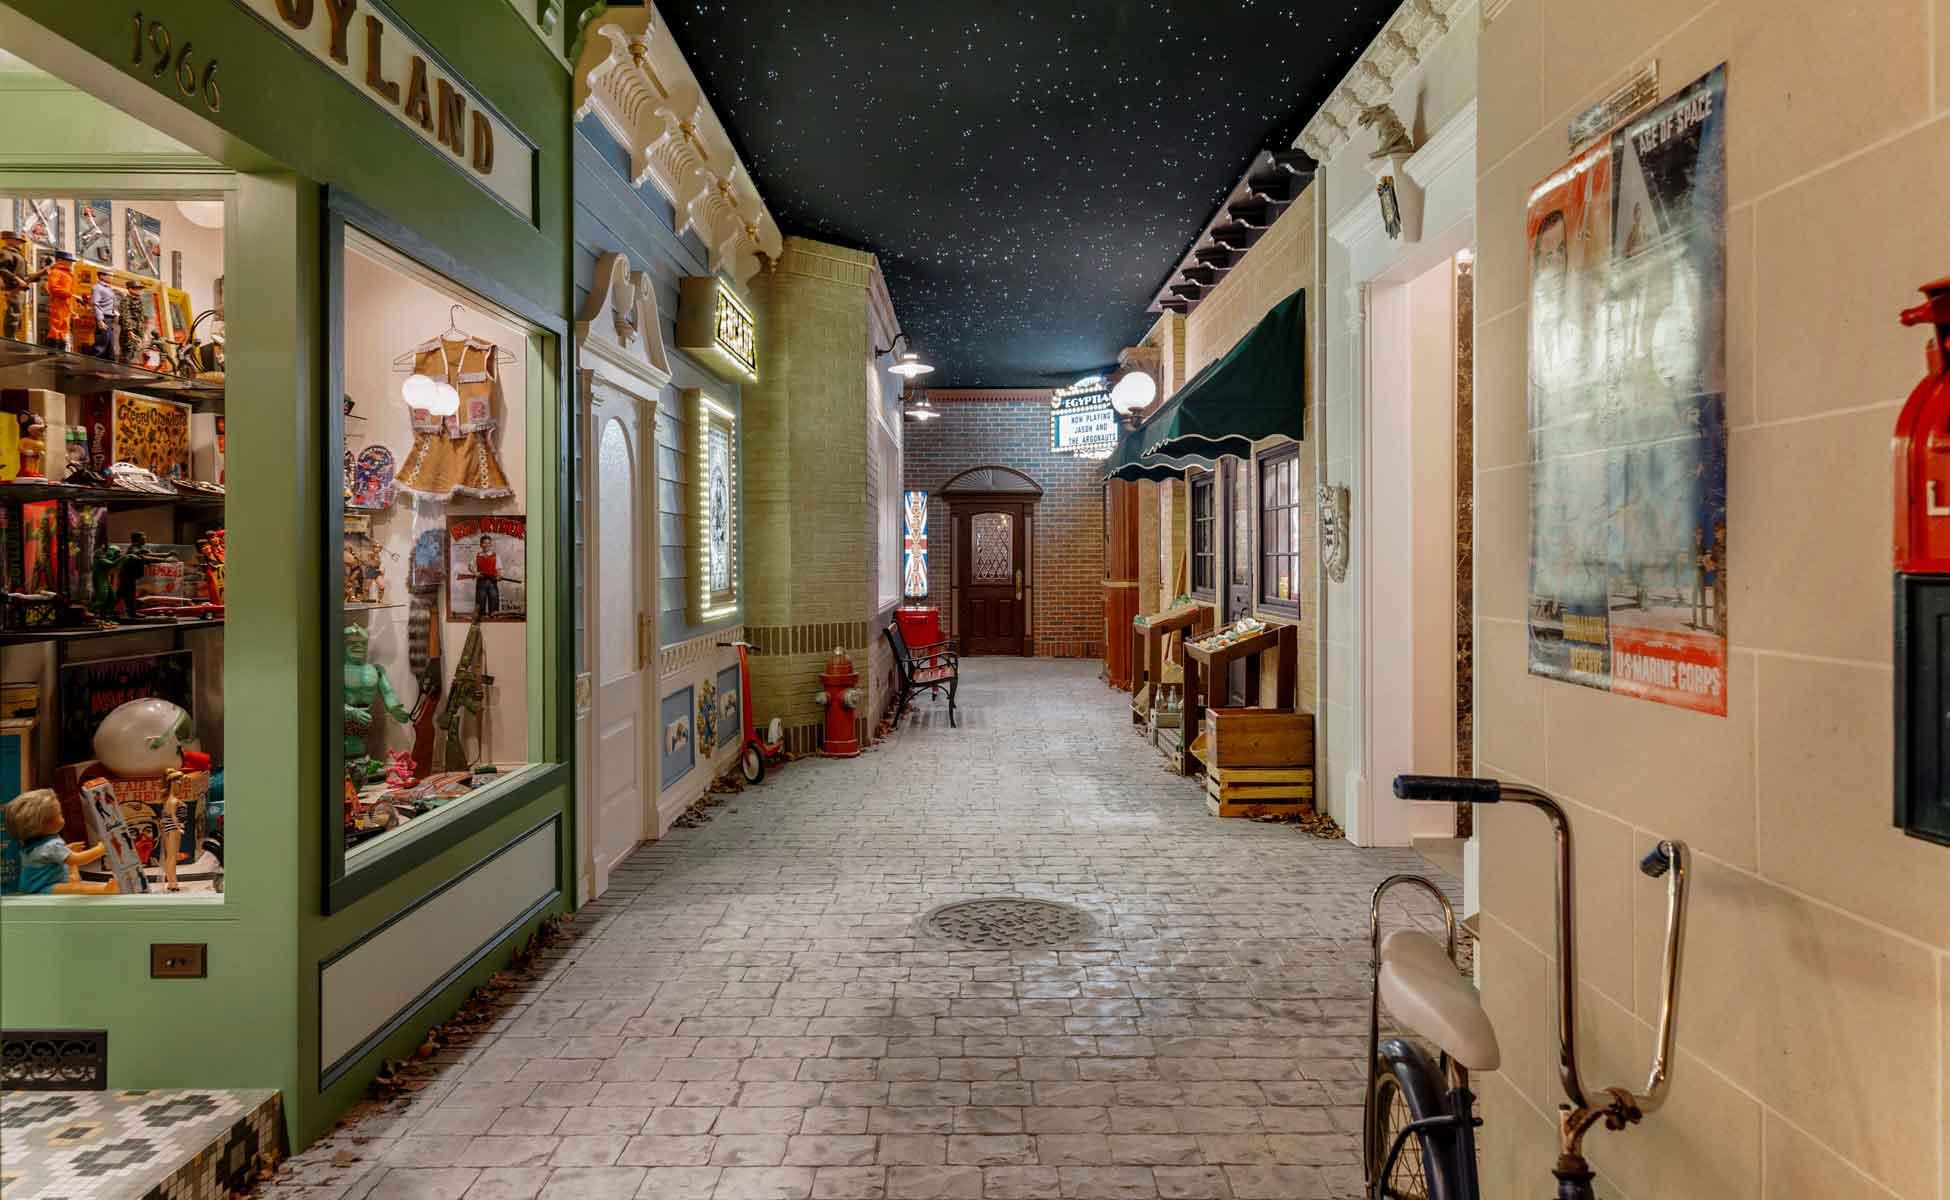 Dream-Visions-Interiors-Street-Town-Square-Settings-Web-LR